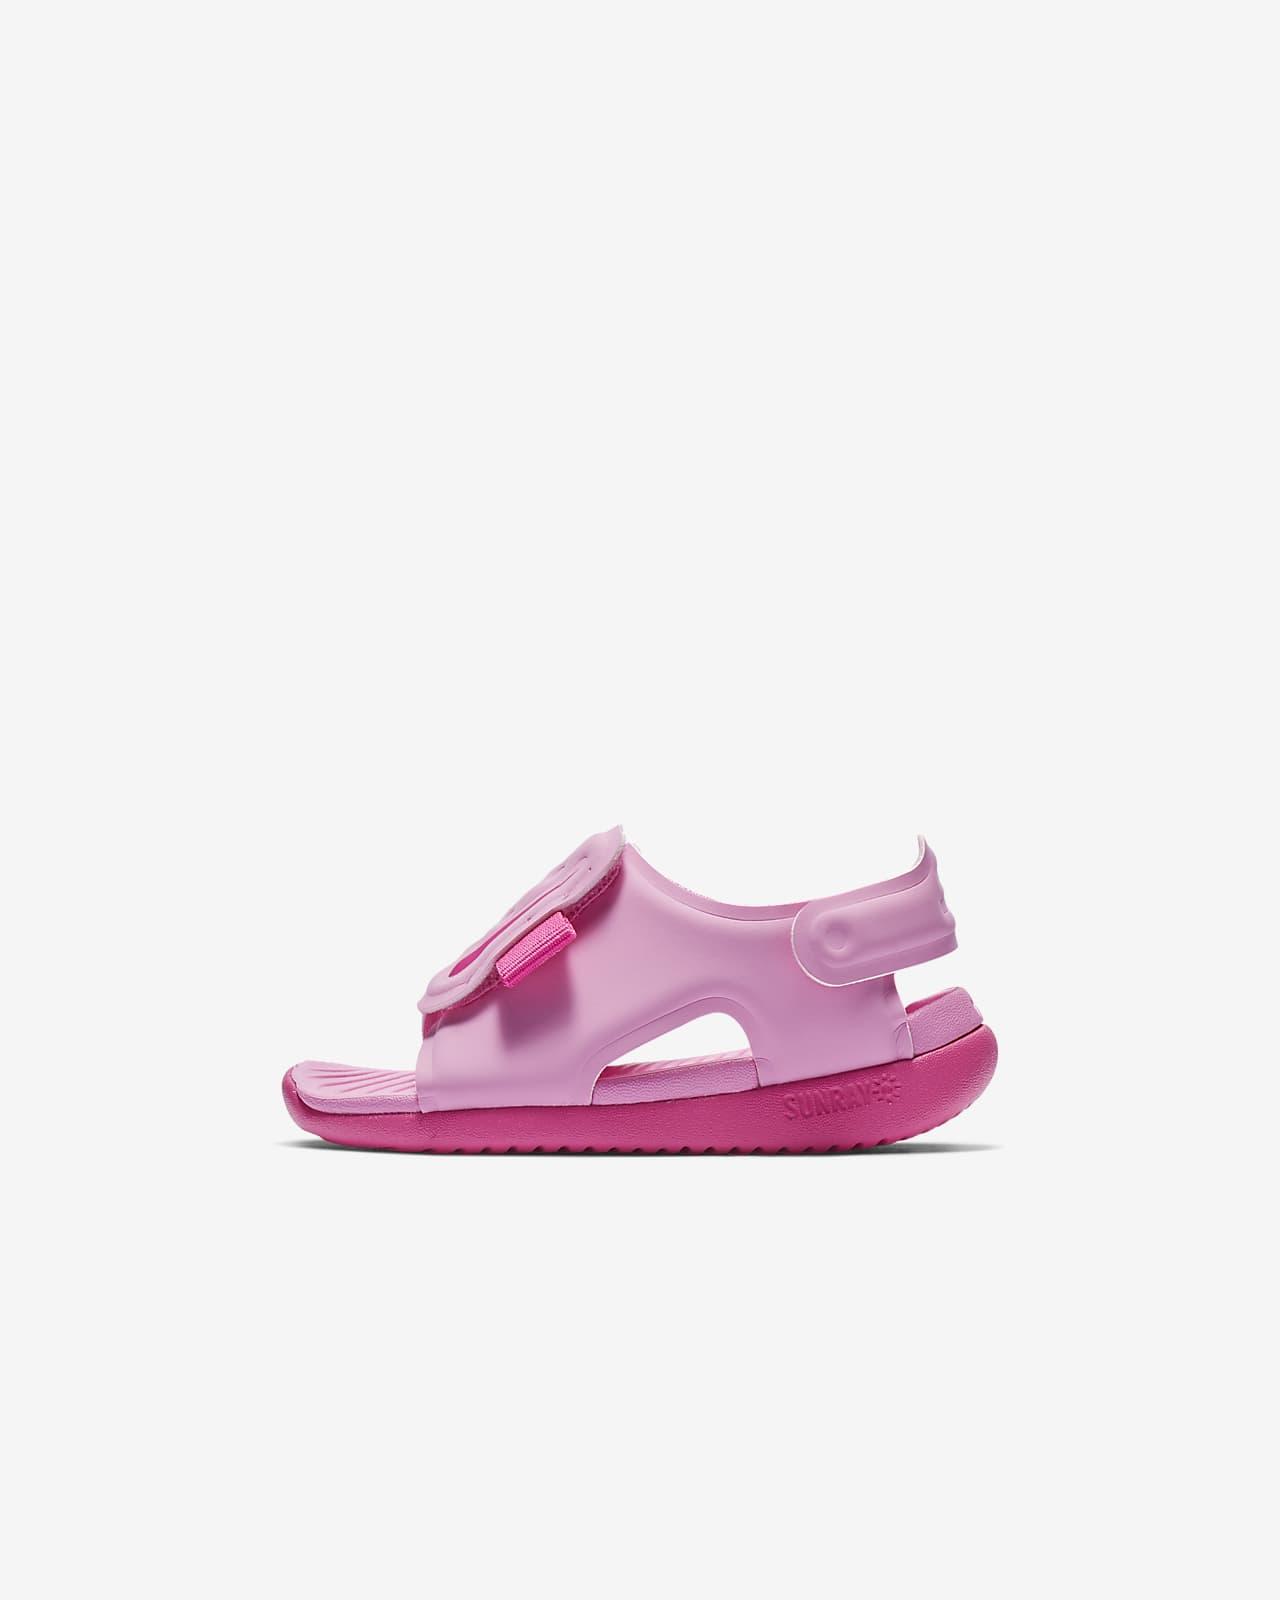 Nike Sunray Adjust 5 Baby \u0026 Toddler